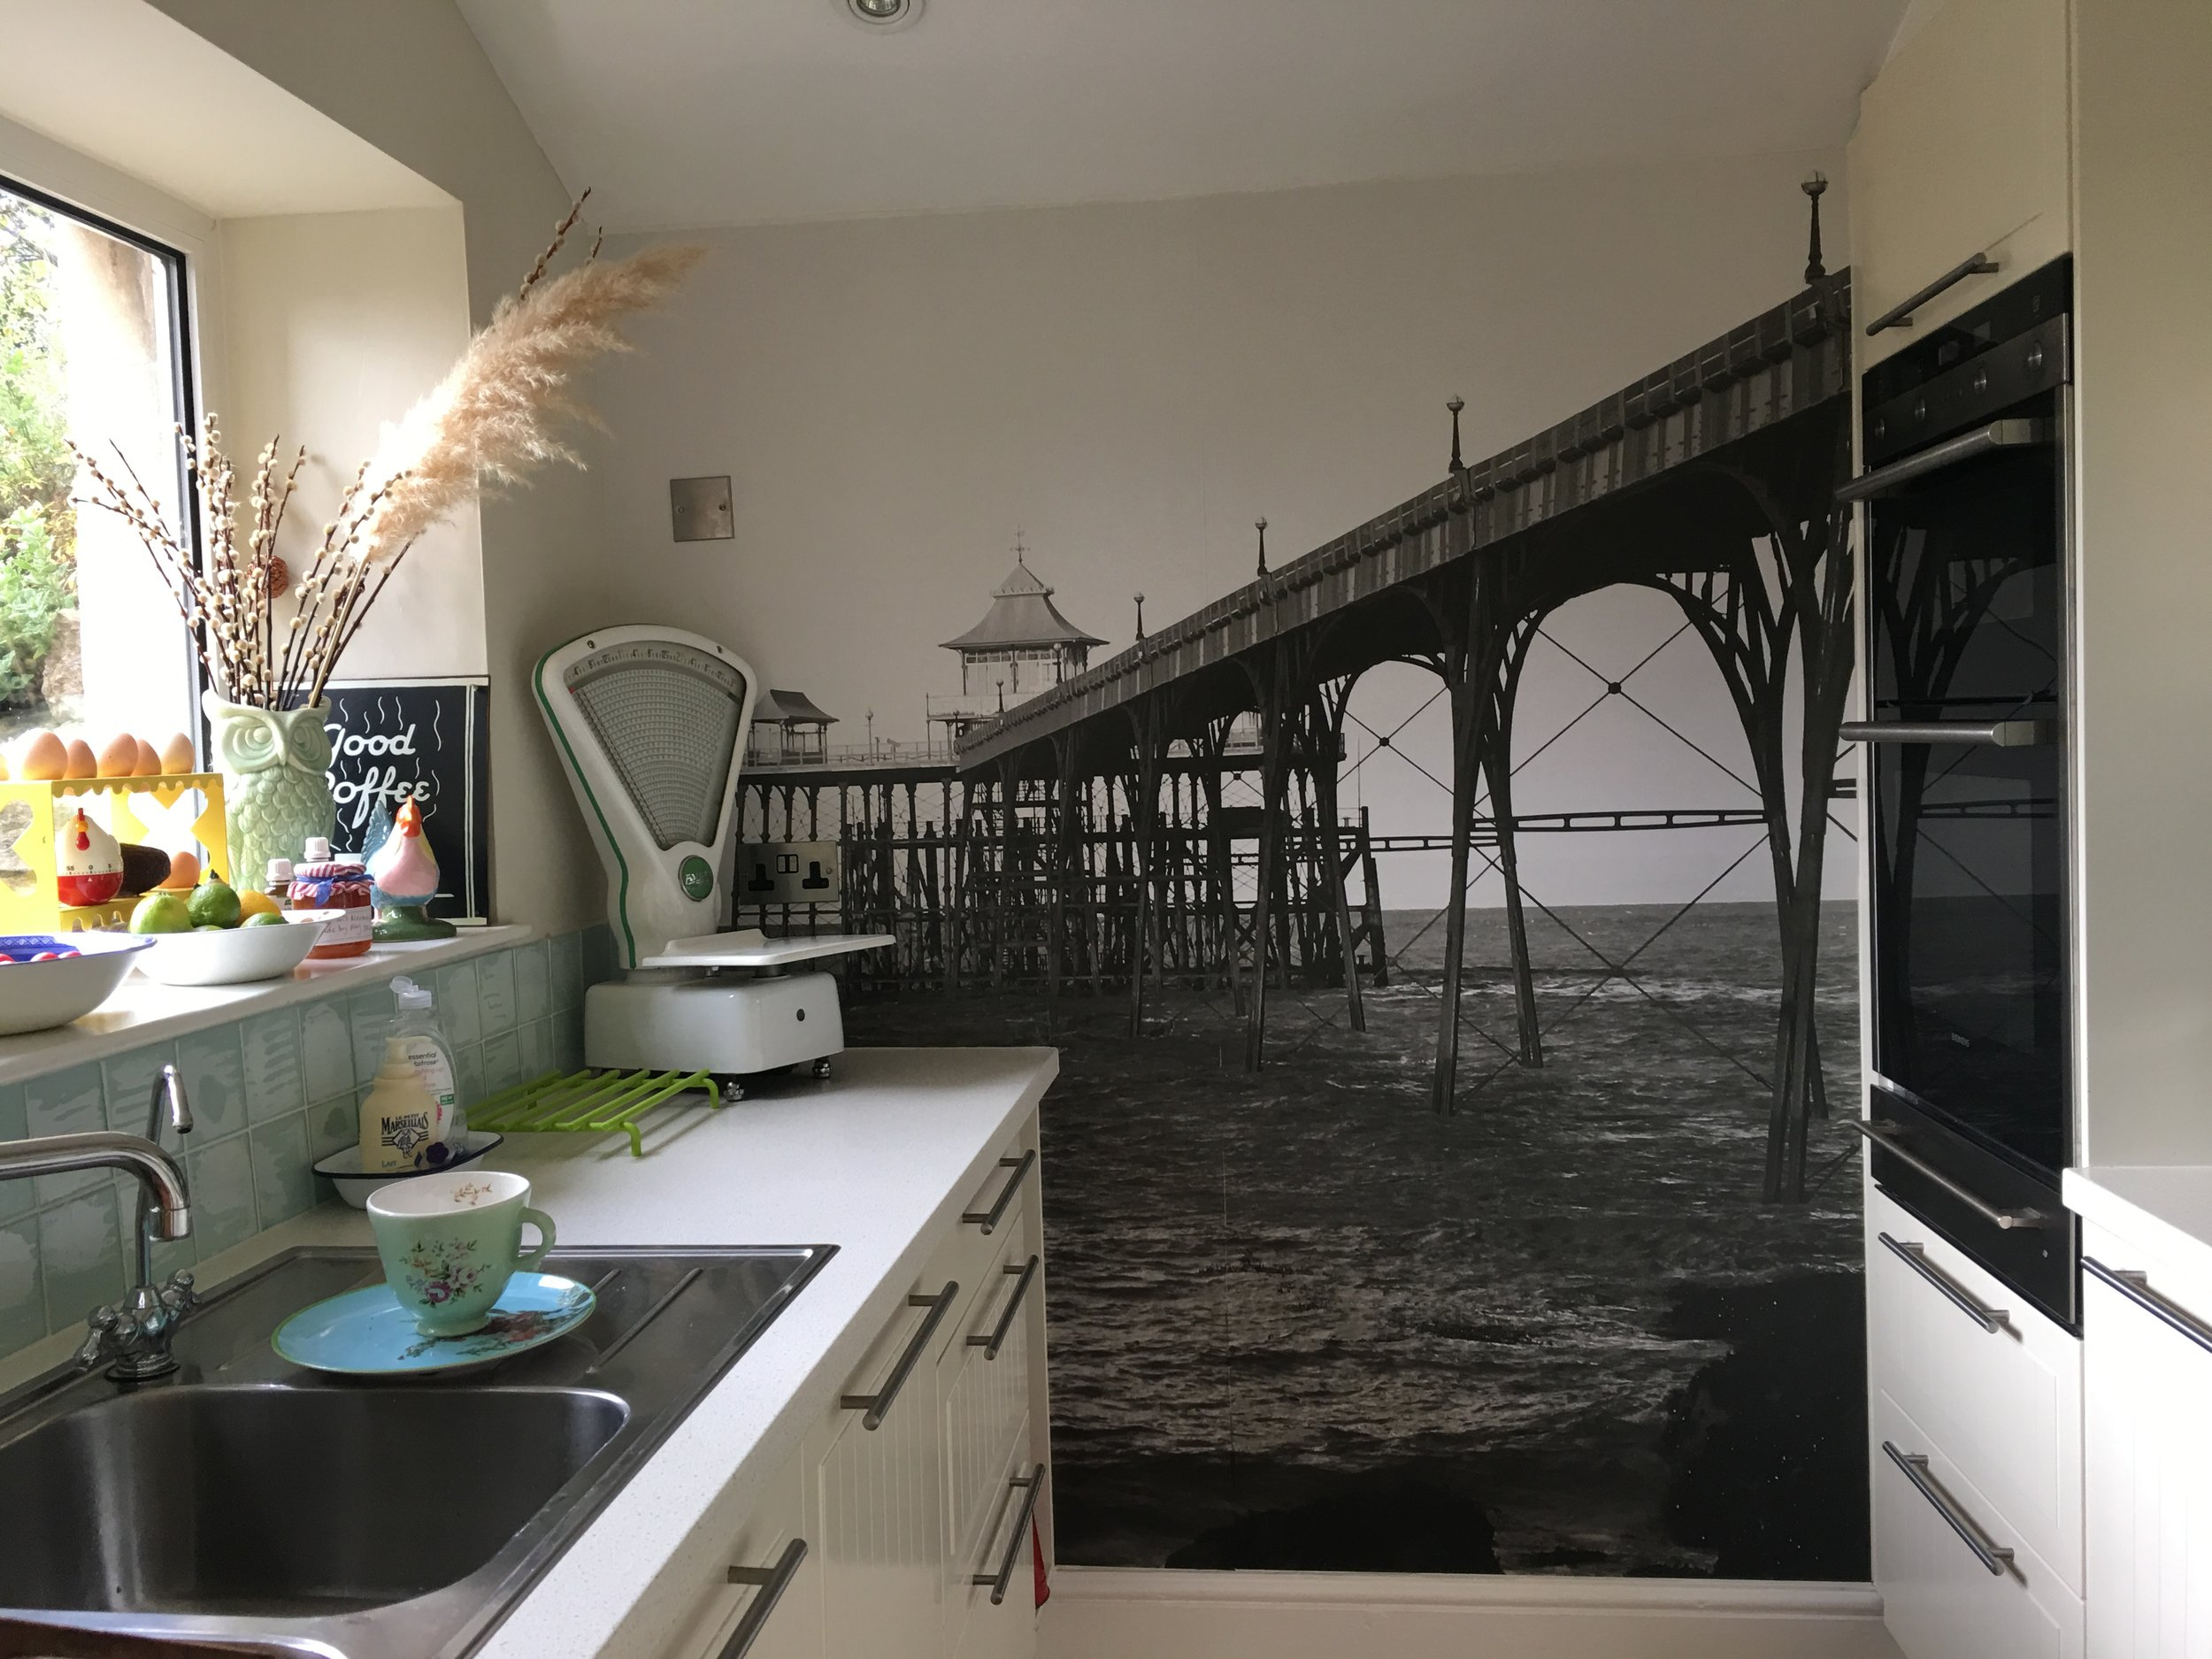 Peel able Wallpaper